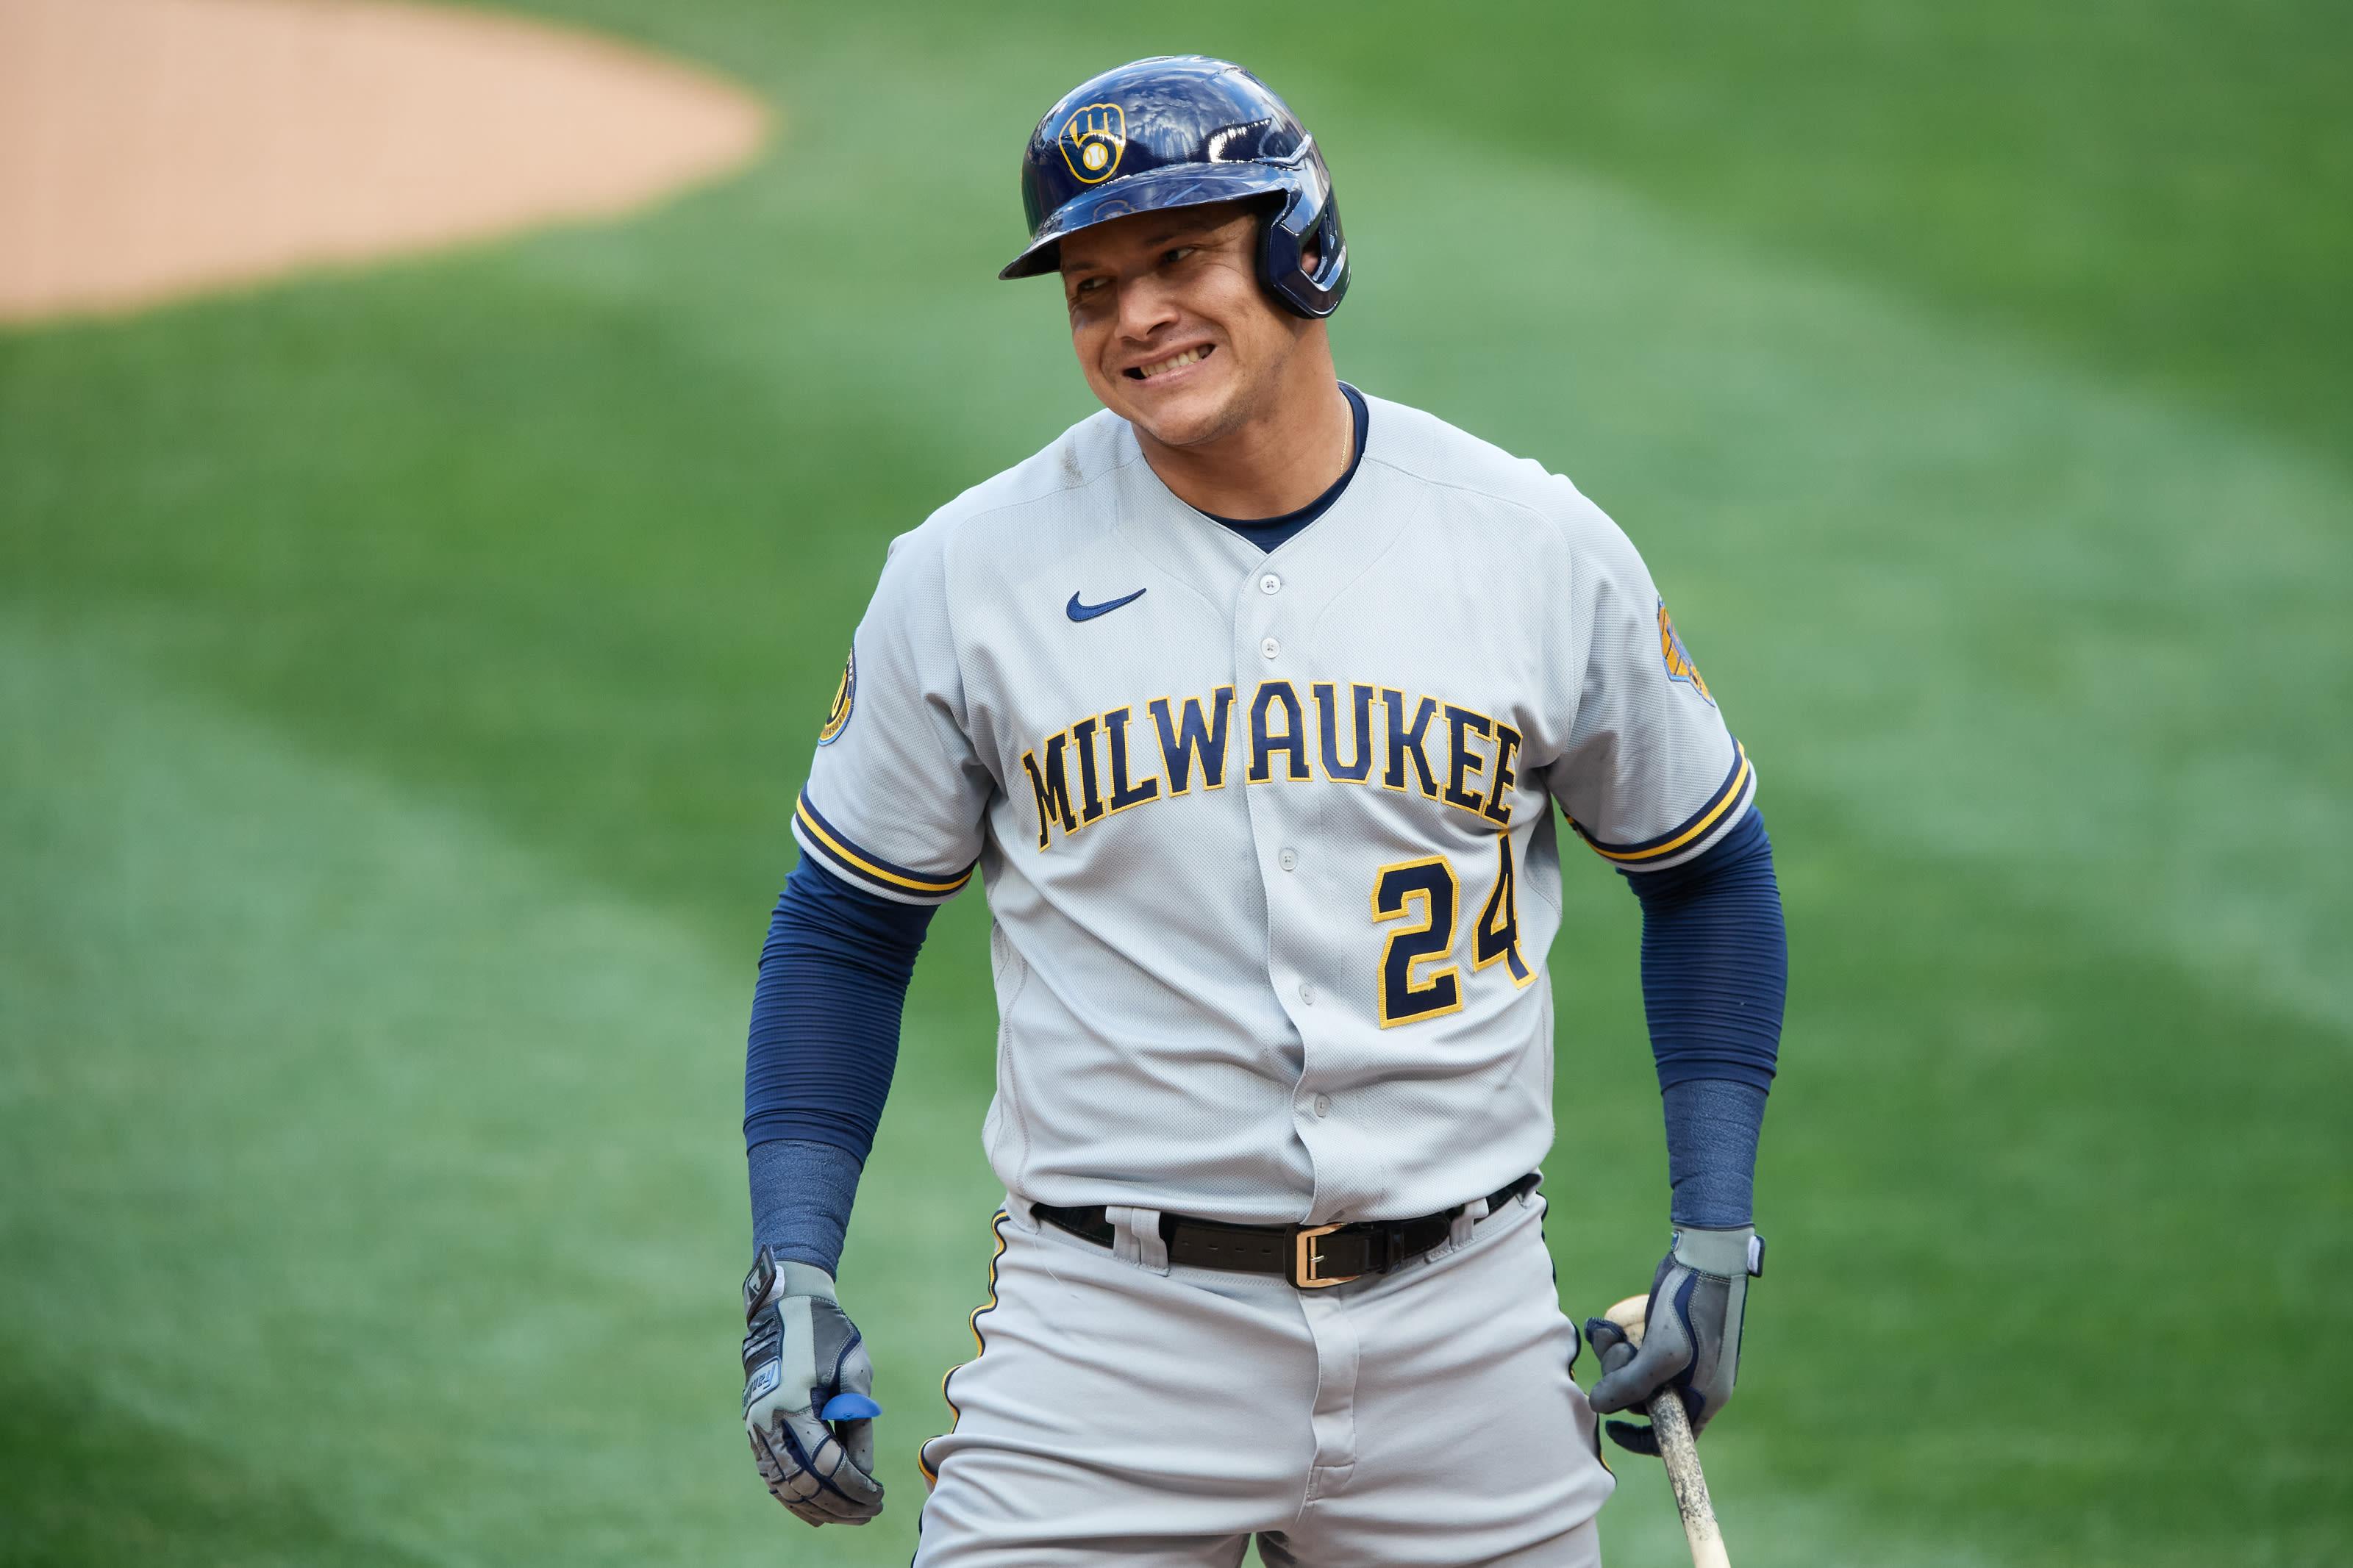 Milwaukee Brewers Avisail Garcia